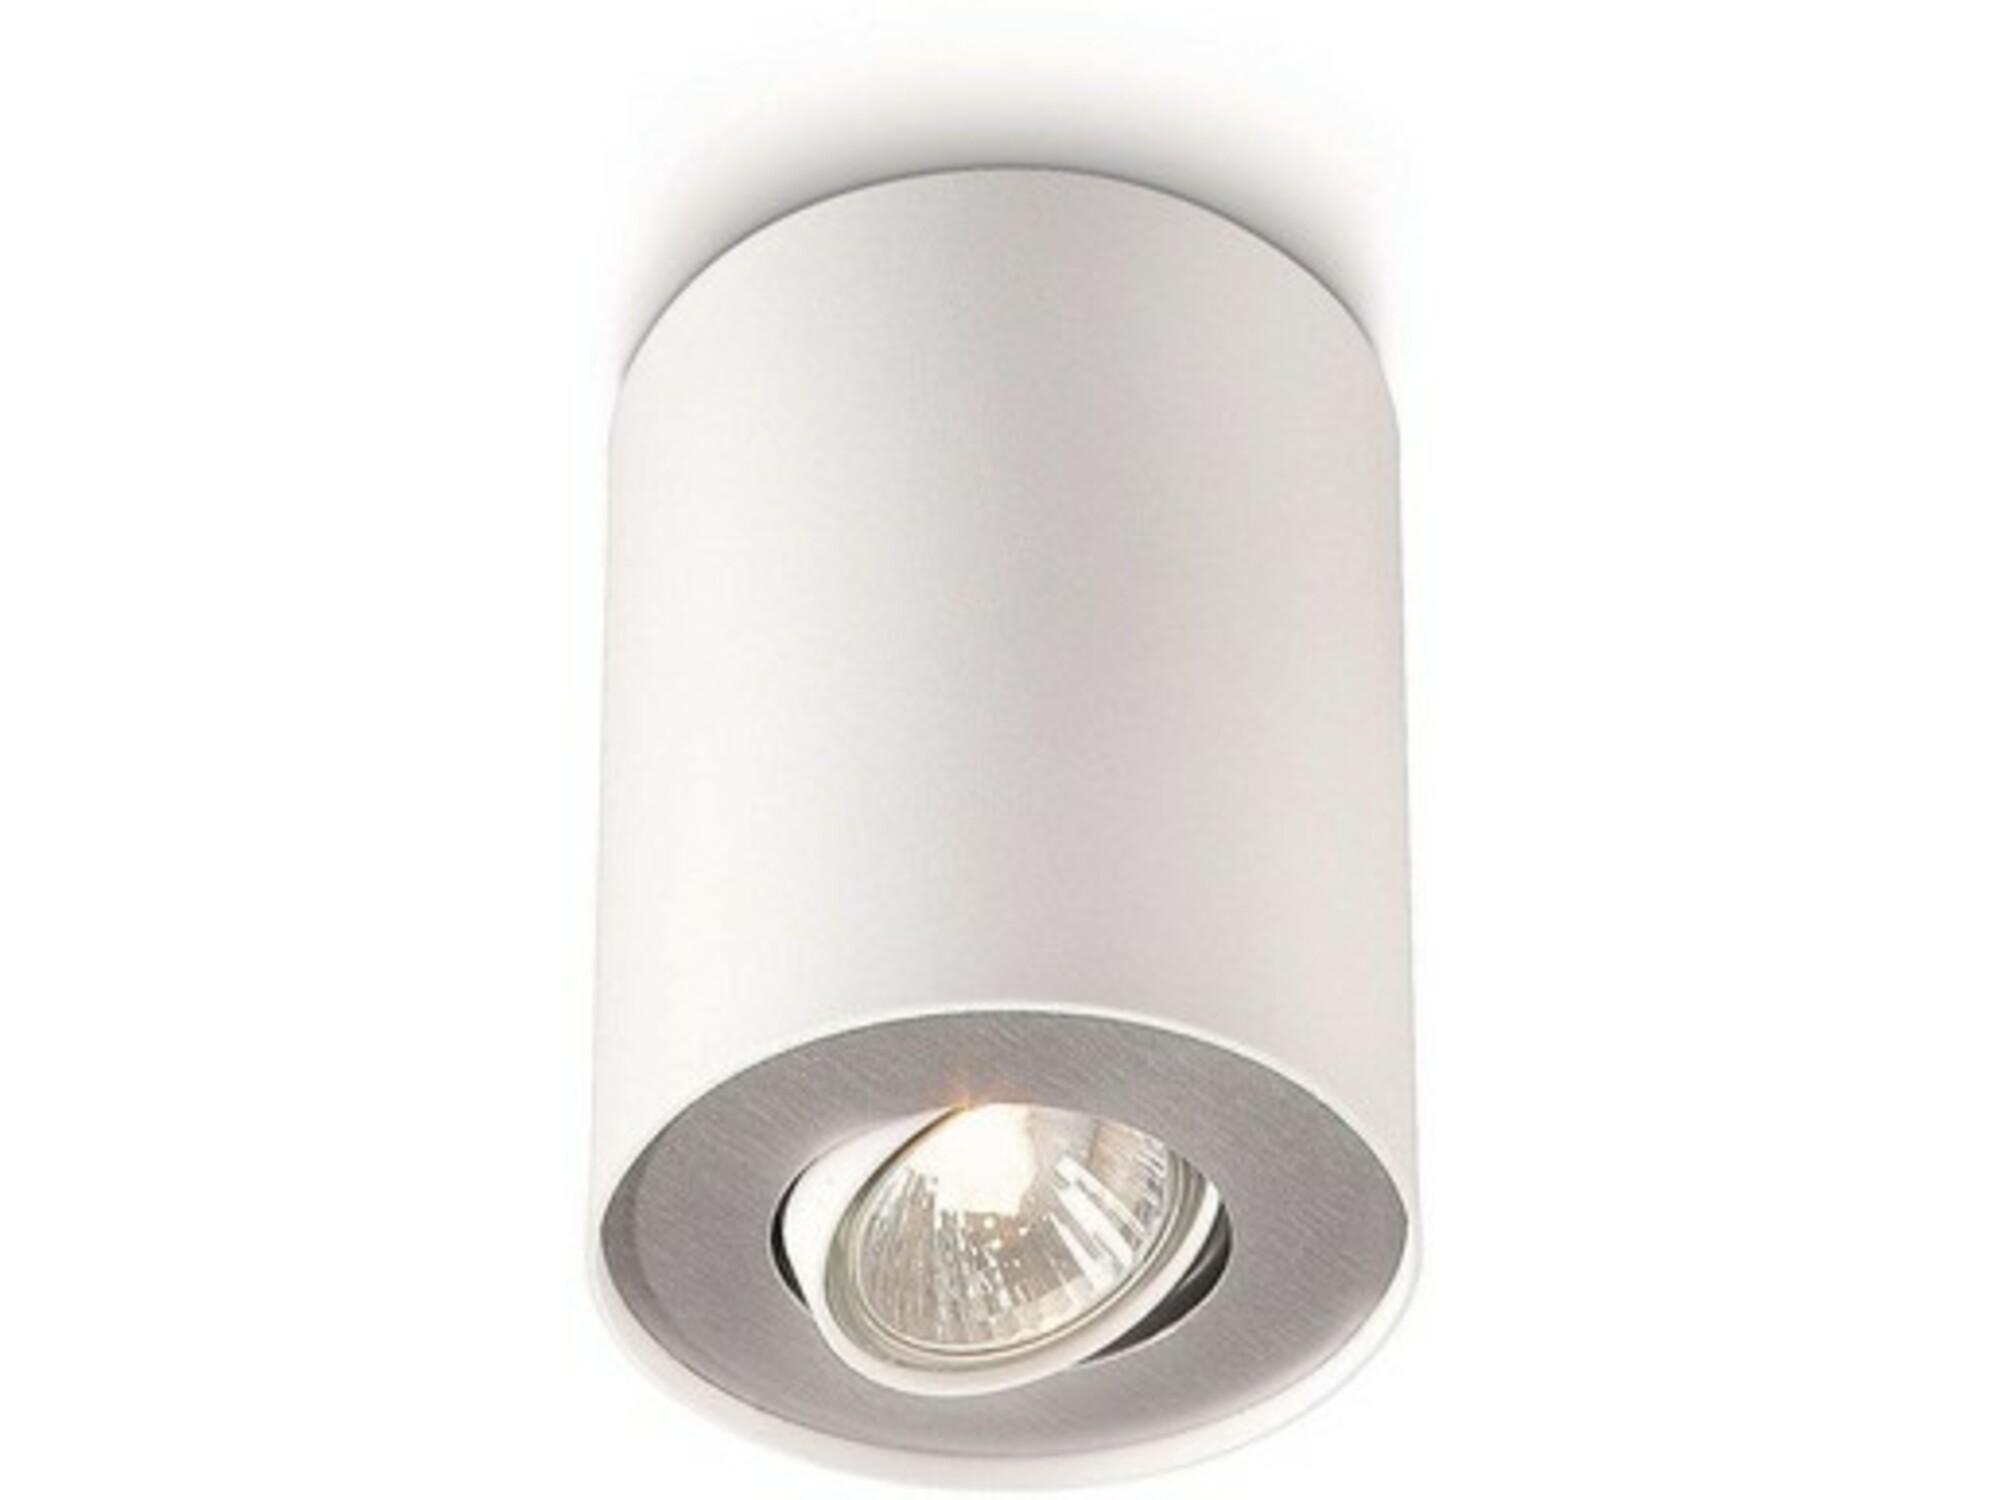 Philips Pillar Spot Svetiljka 1X50W Bez Sijalice 56330/31/Pn